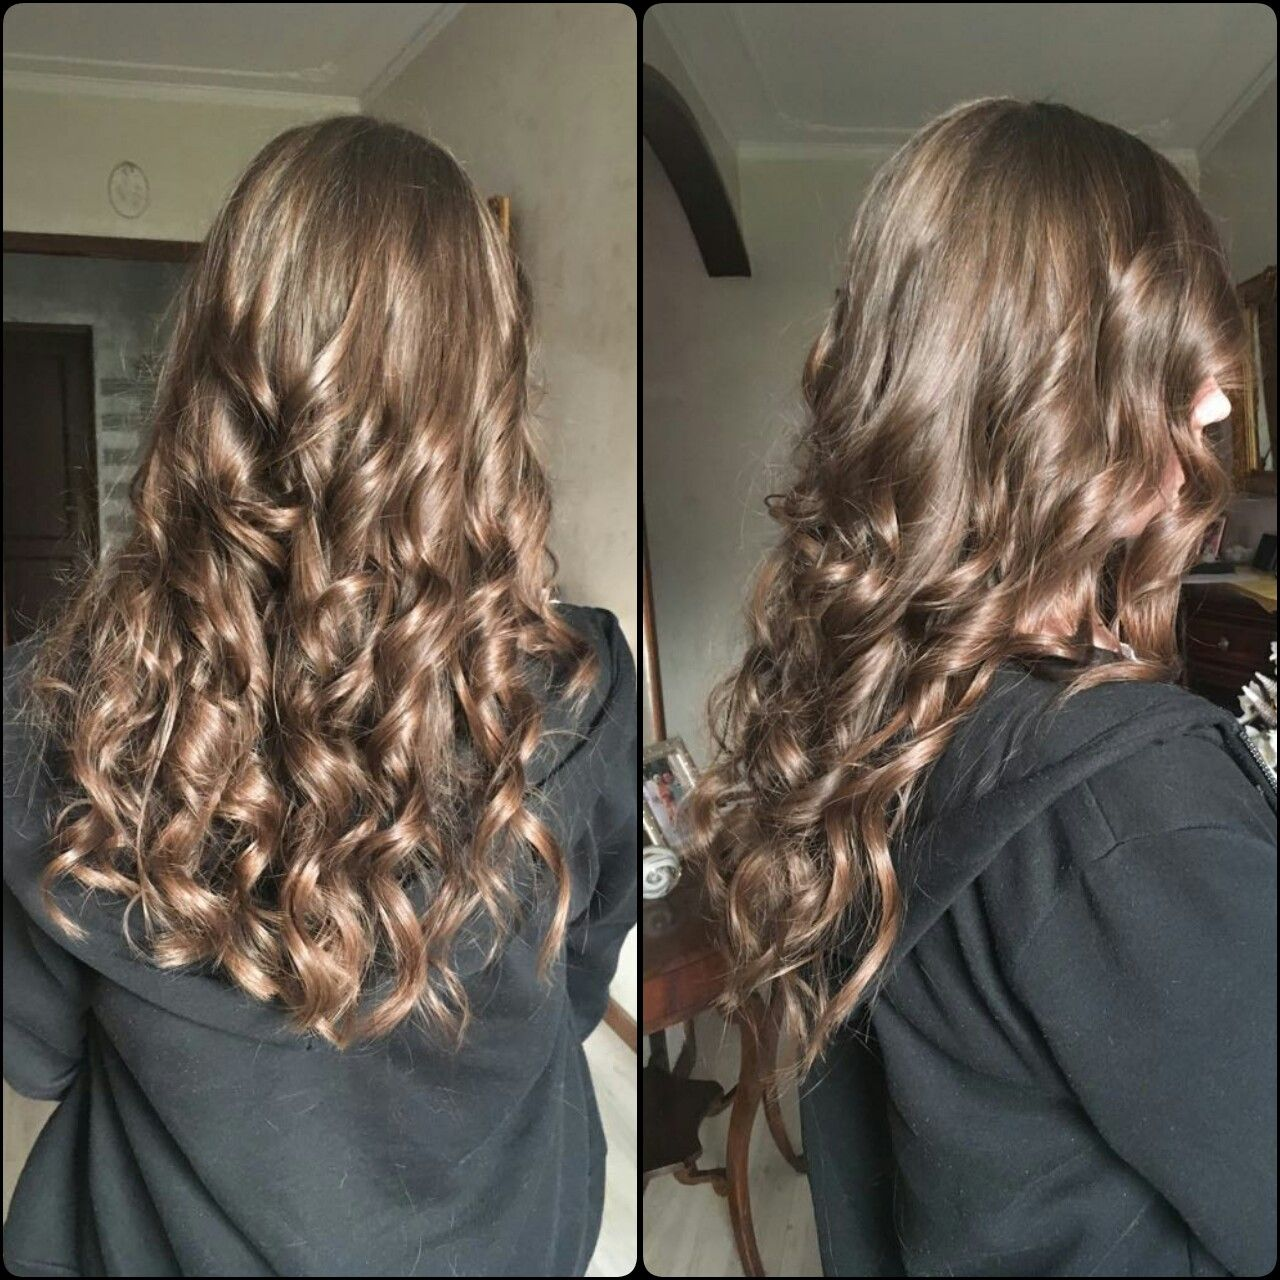 New hair style playgooglestoreappsdetailsidudcom